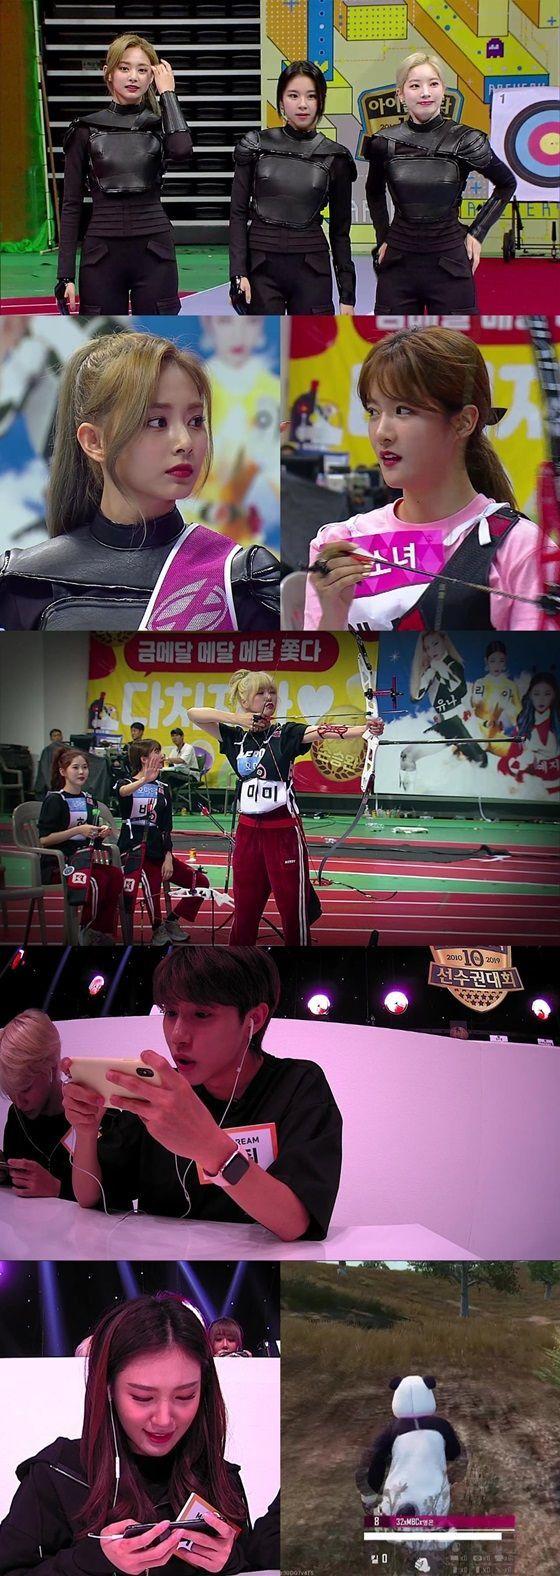 MBC '추석특집 아육대'에서는 다양한 아이돌 그룹이 출연한다. / 사진=MBC